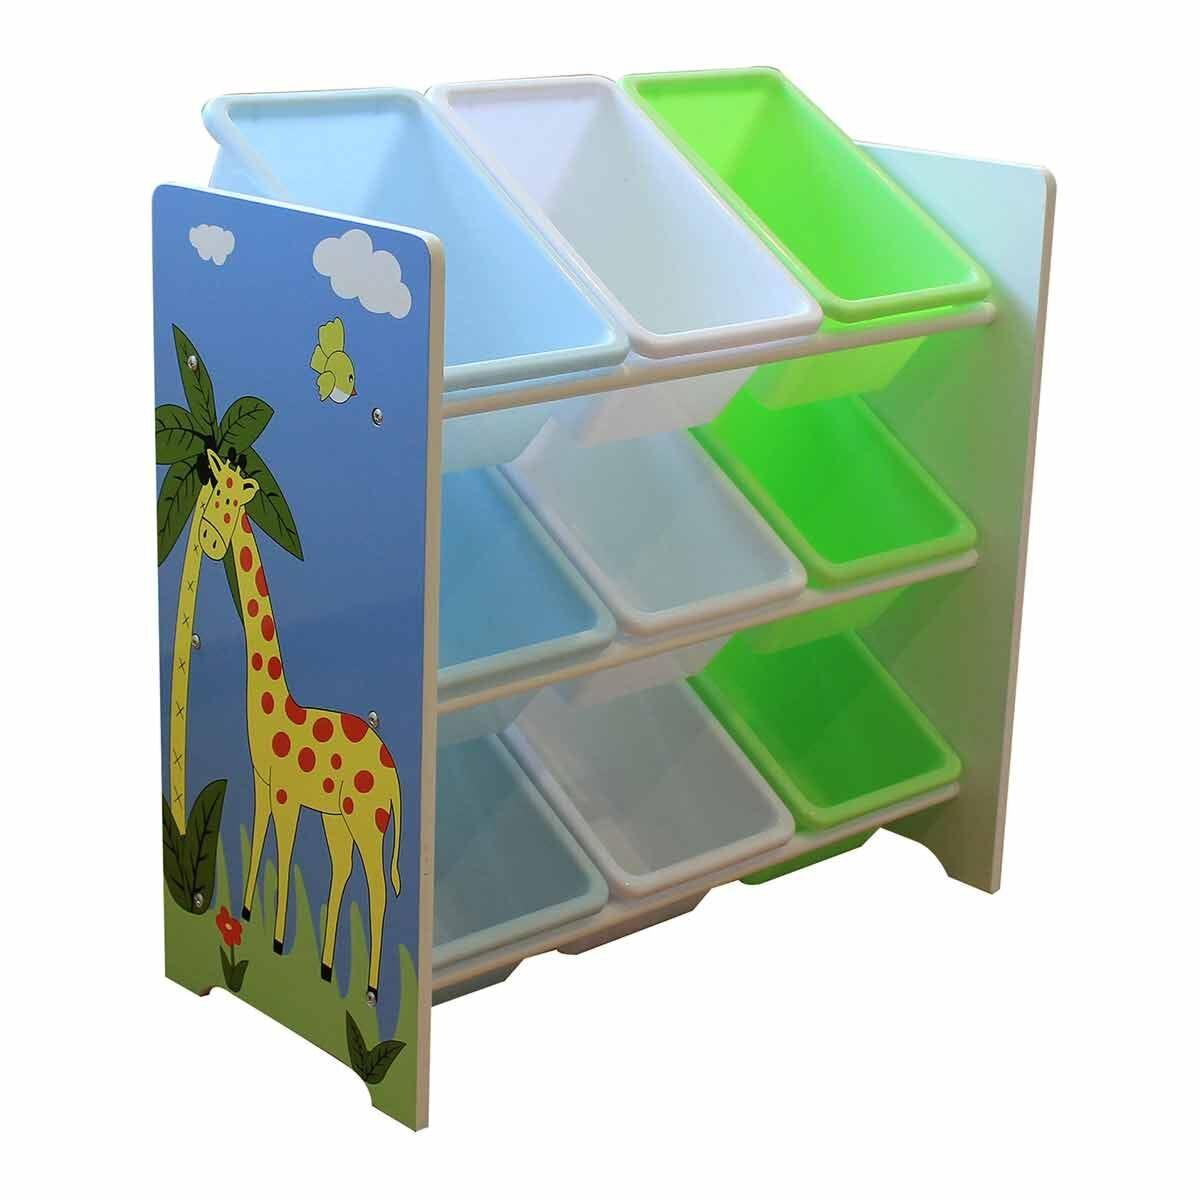 Liberty House Toys Savannah Toy Shelf with 9 Storage Bins